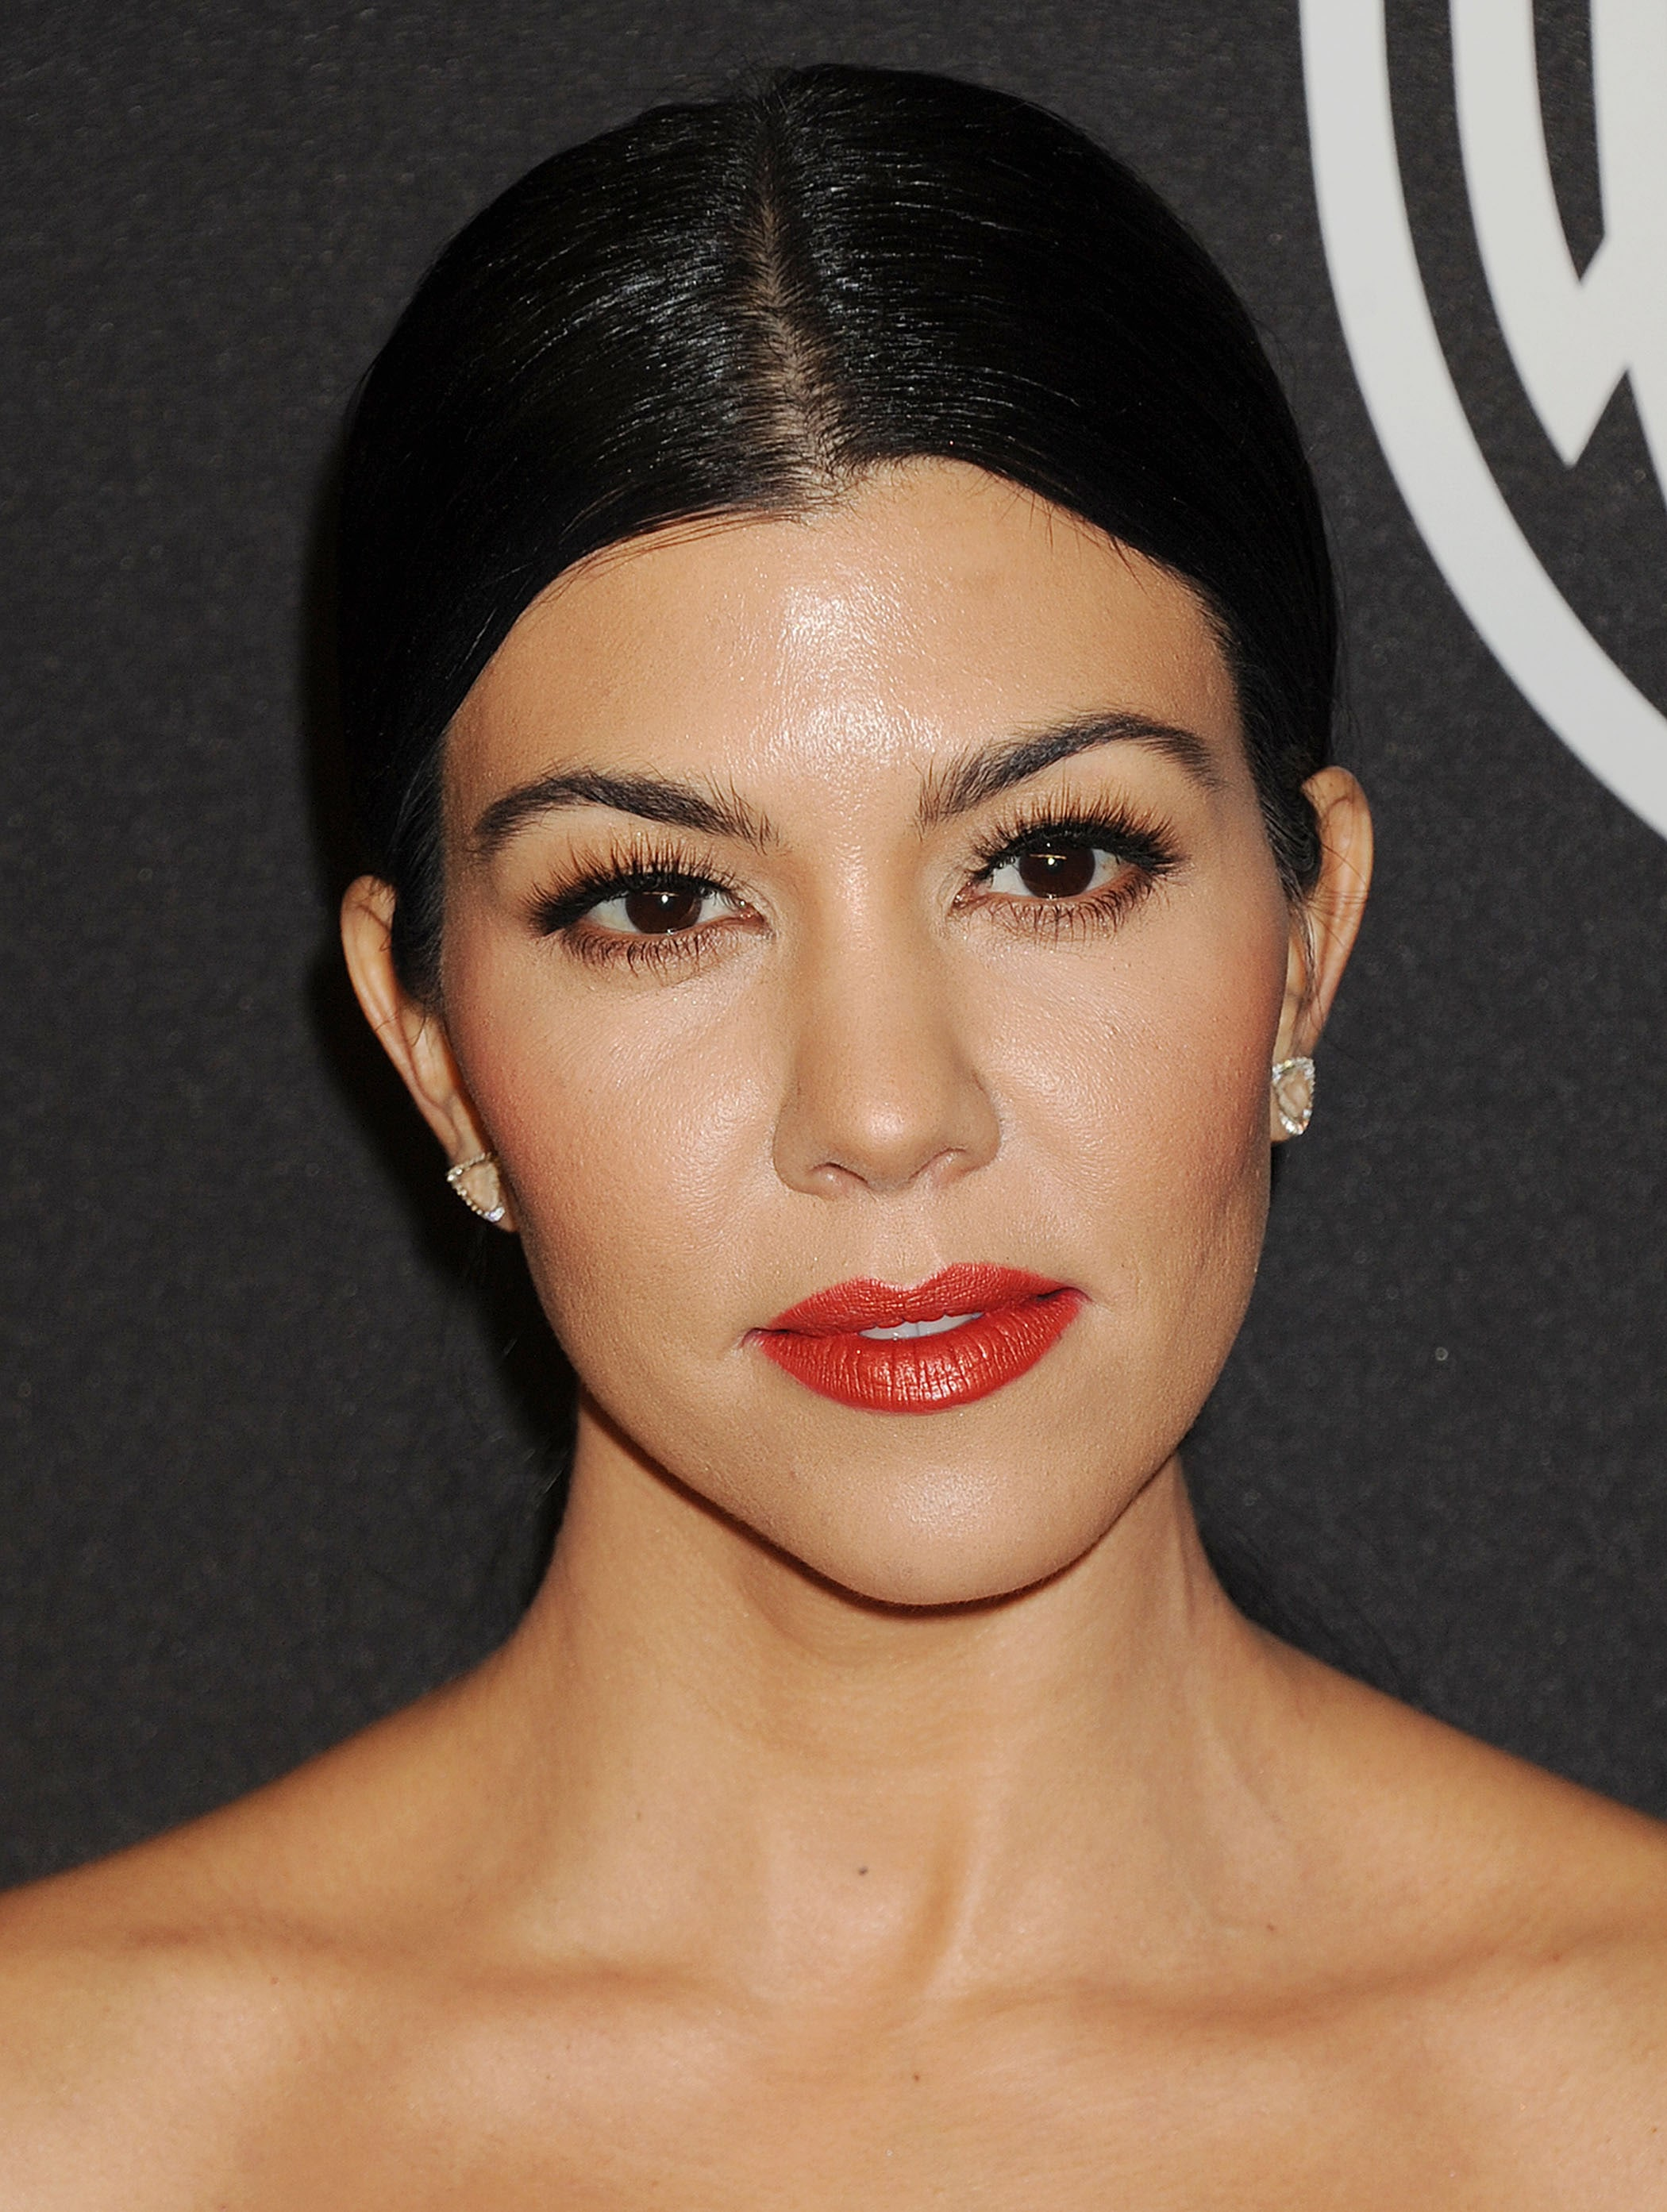 Kourtney Kardashian con cabello atado hacia atrás y raya al medio